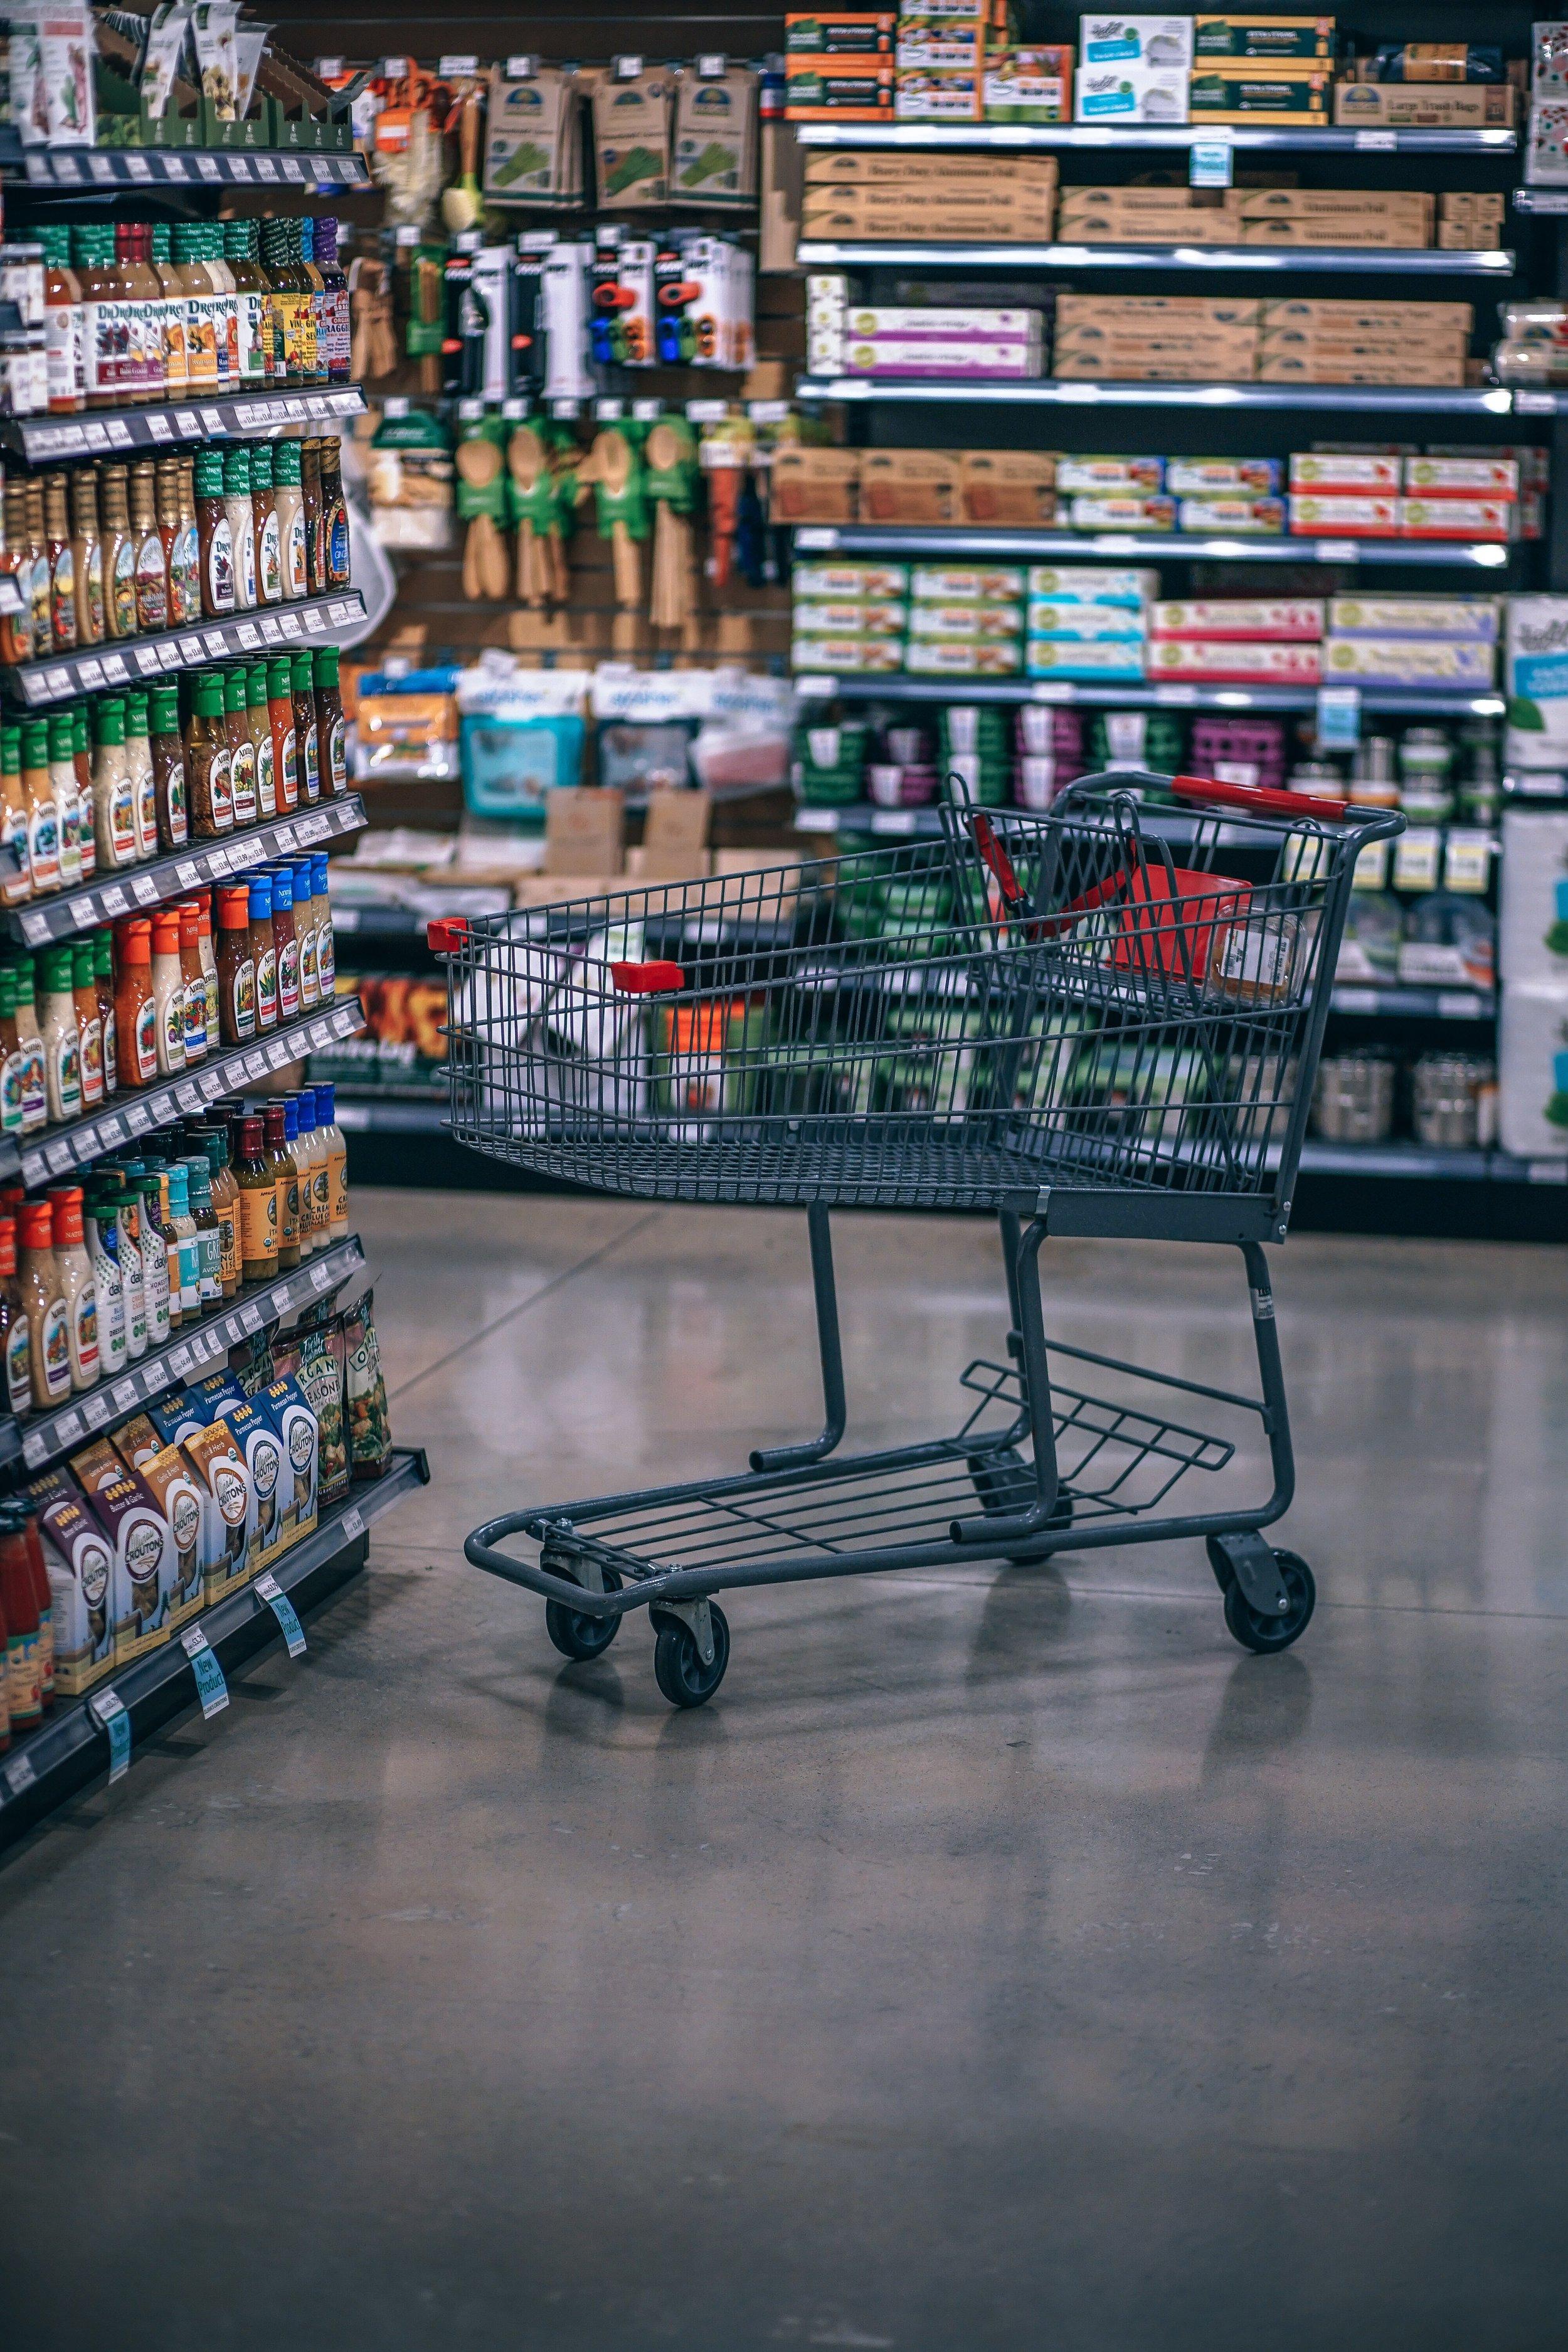 aisle-buy-cart-811105.jpg